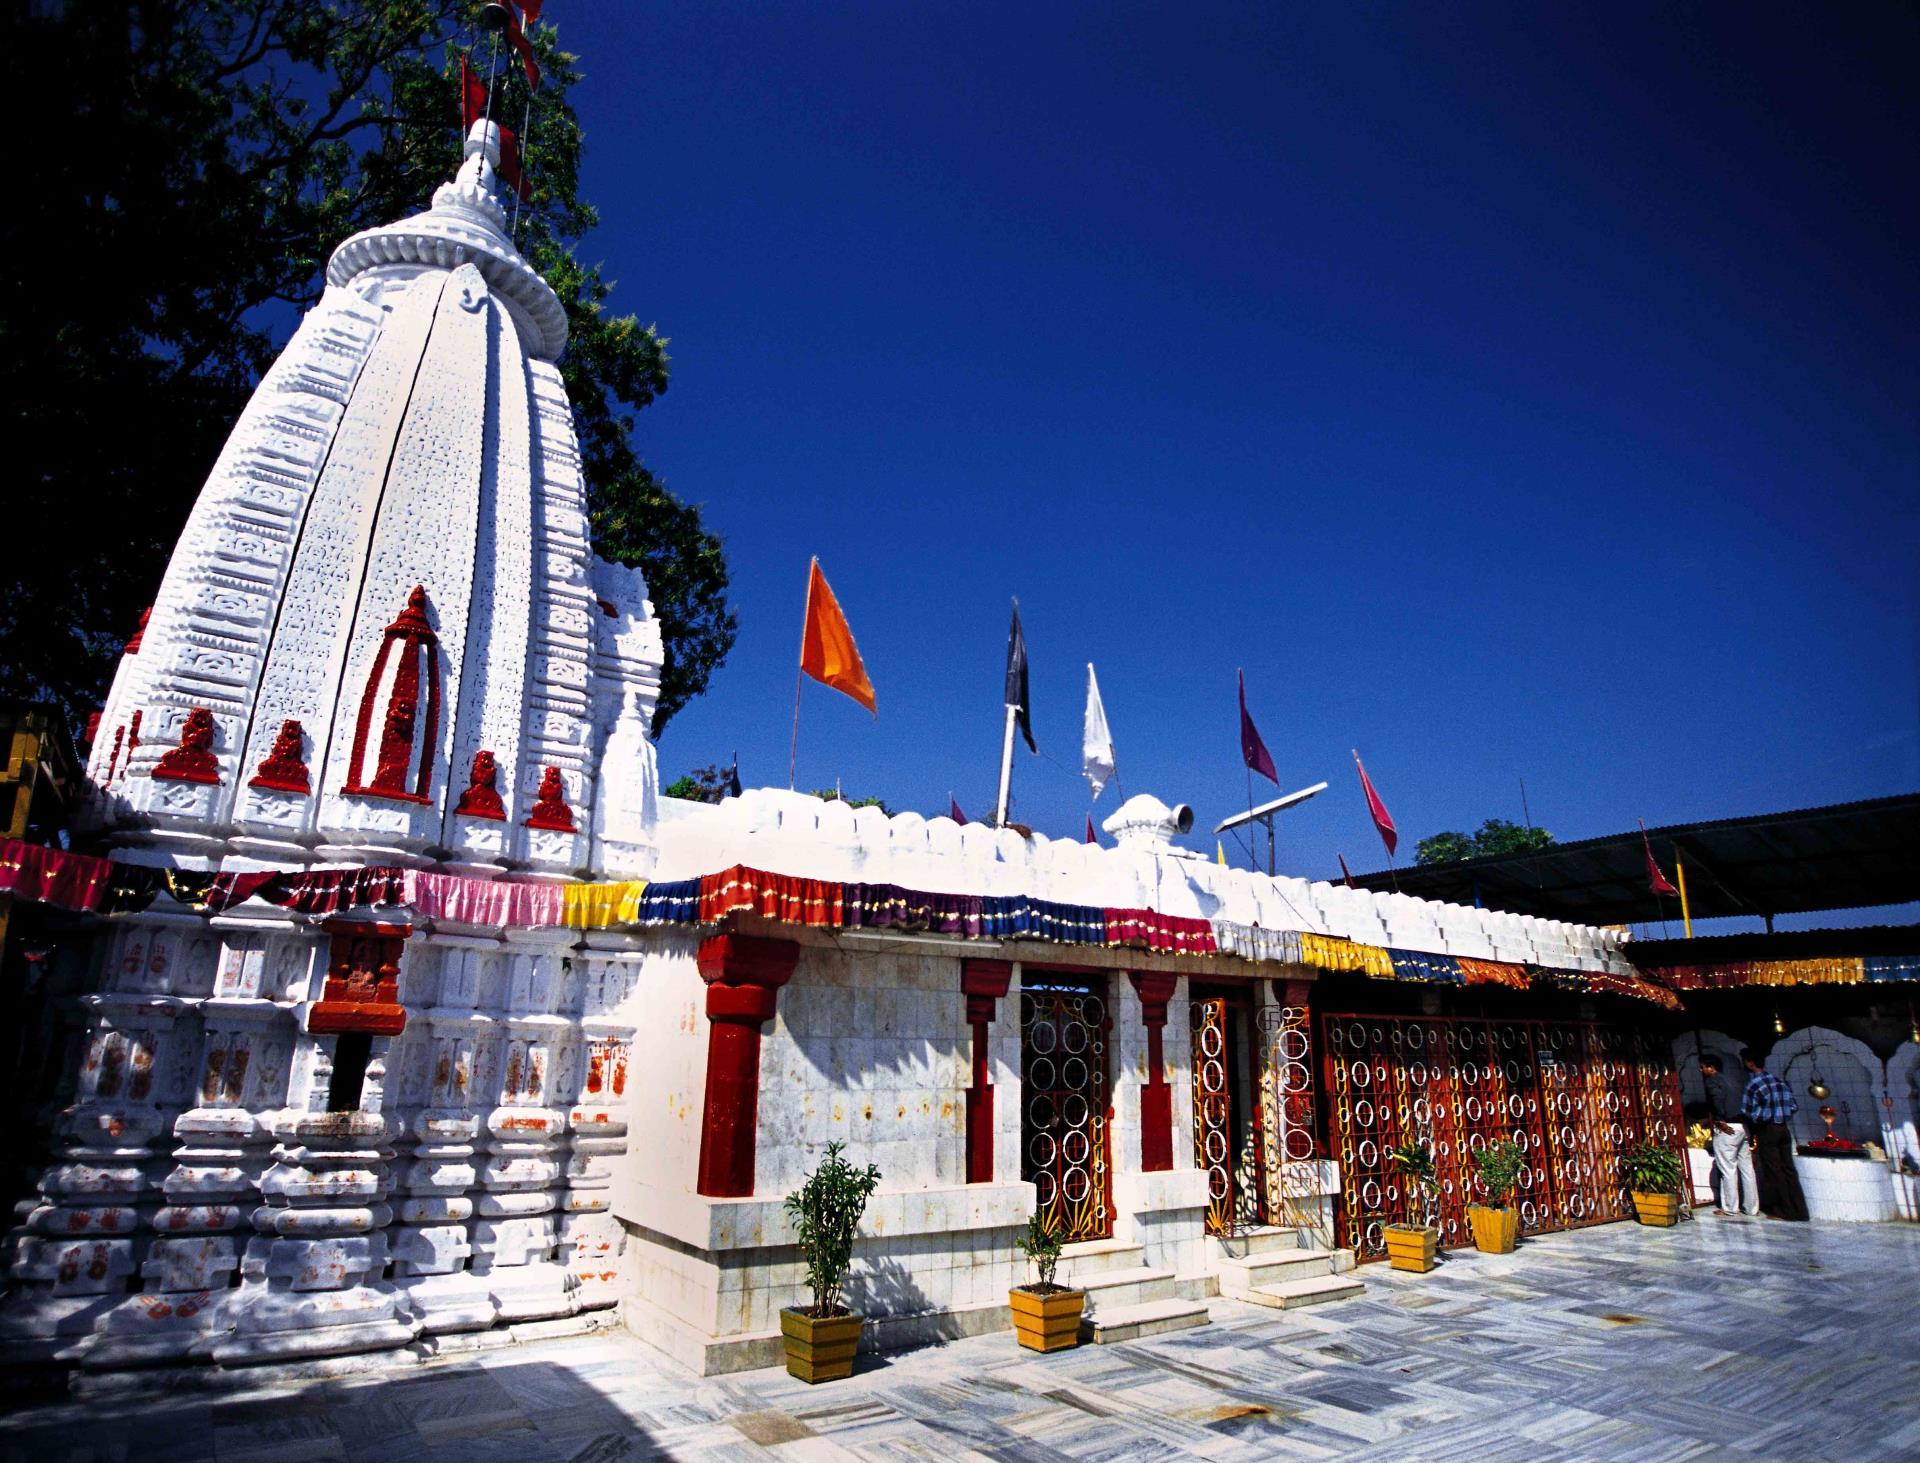 Raipur mahamaya temple 0